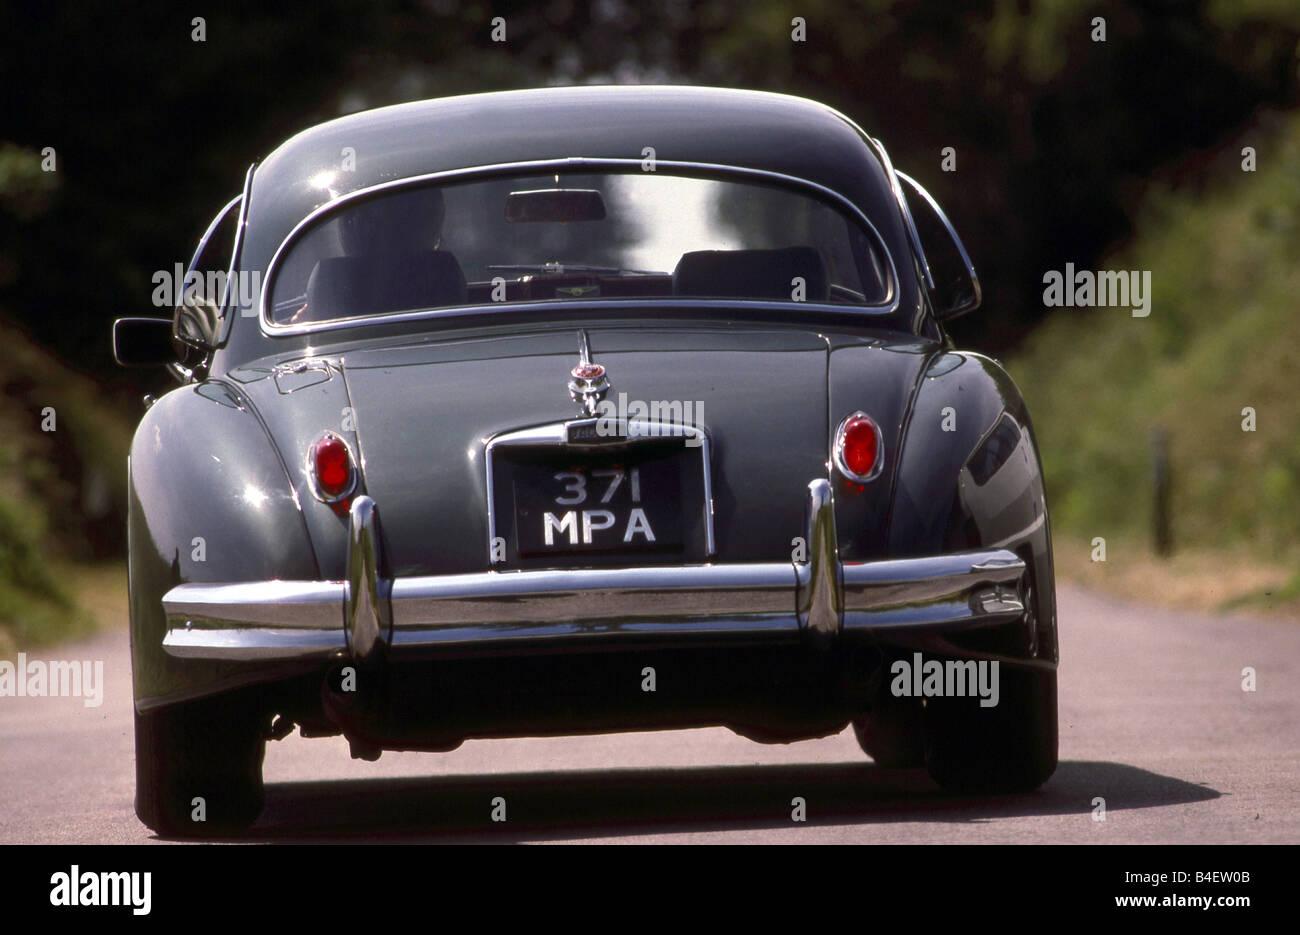 Jaguar XK 150 Coupé, model year 1957-1961, dark grey, standing, back view, road, country road - Stock Image